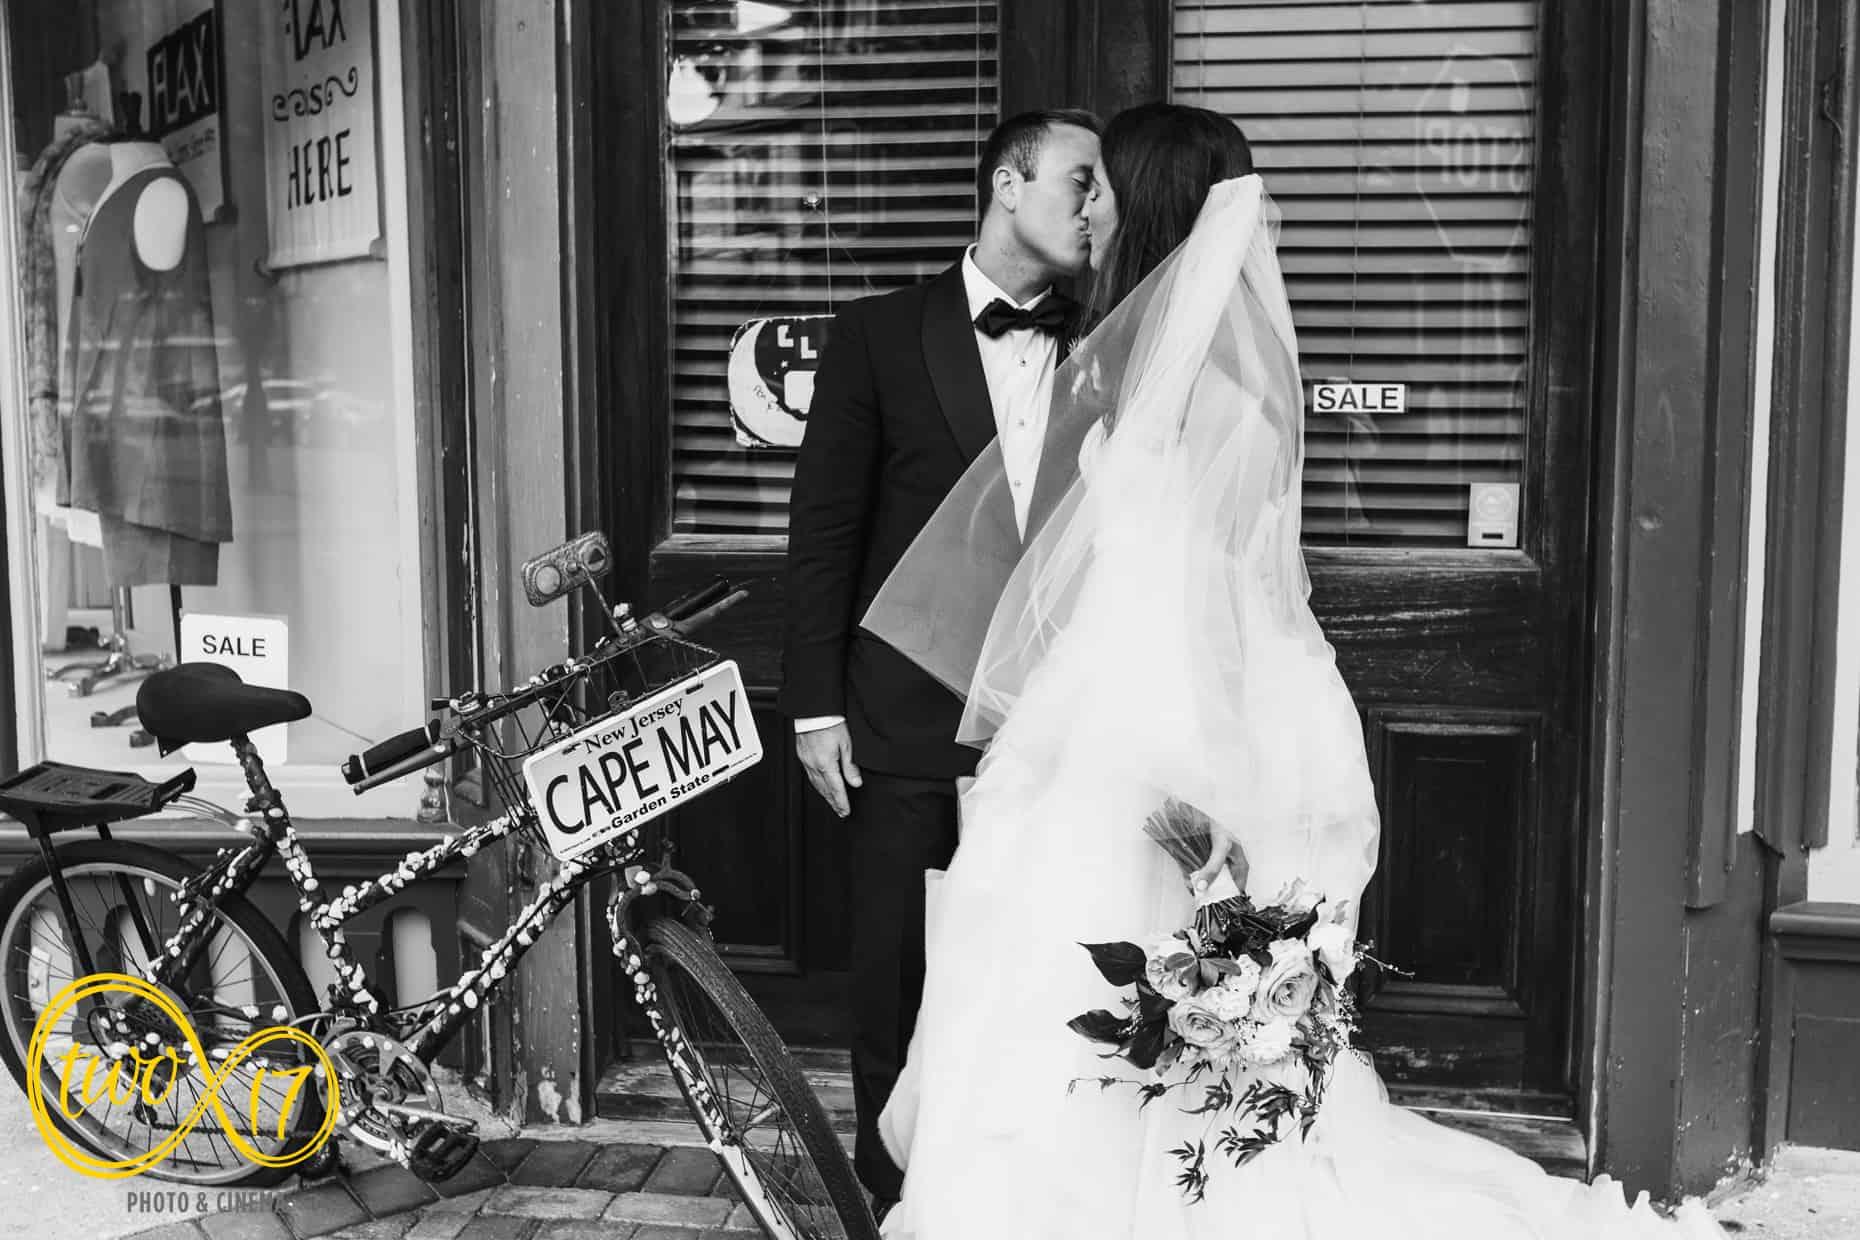 Cape May Wedding Photo